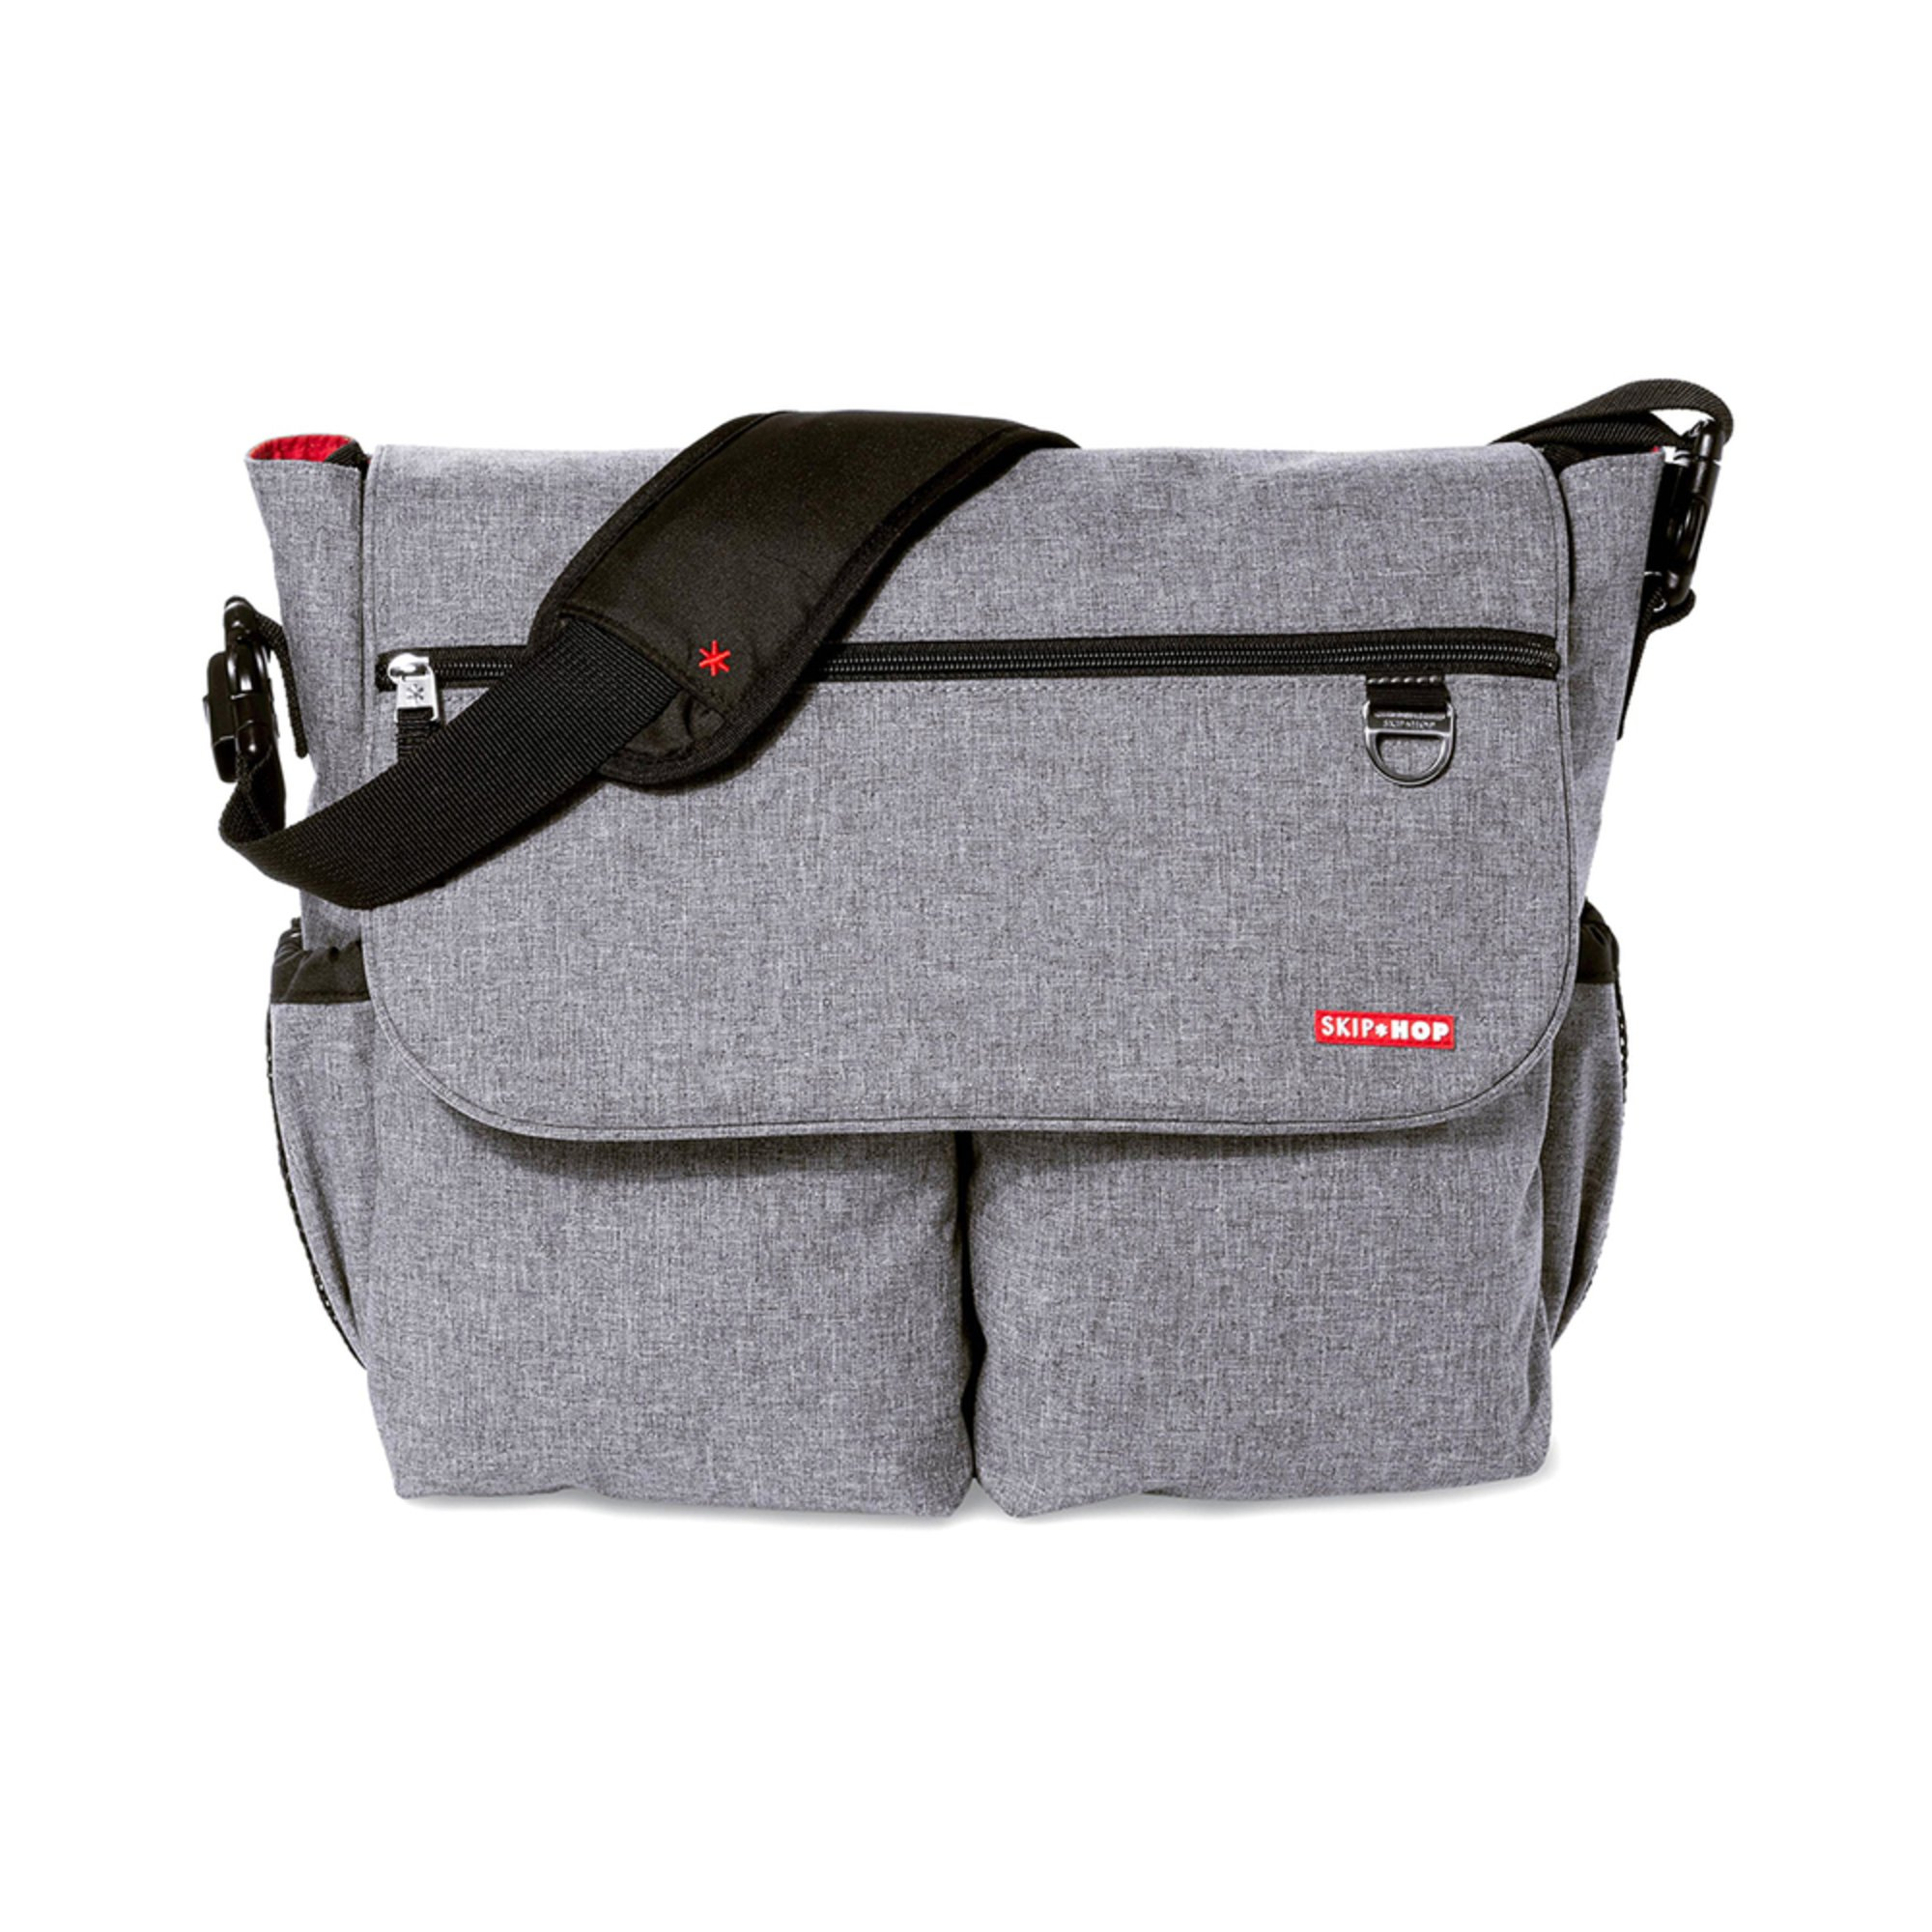 skip hop dash signature diaper bag heather grey messenger crossbody bags shop your navy. Black Bedroom Furniture Sets. Home Design Ideas